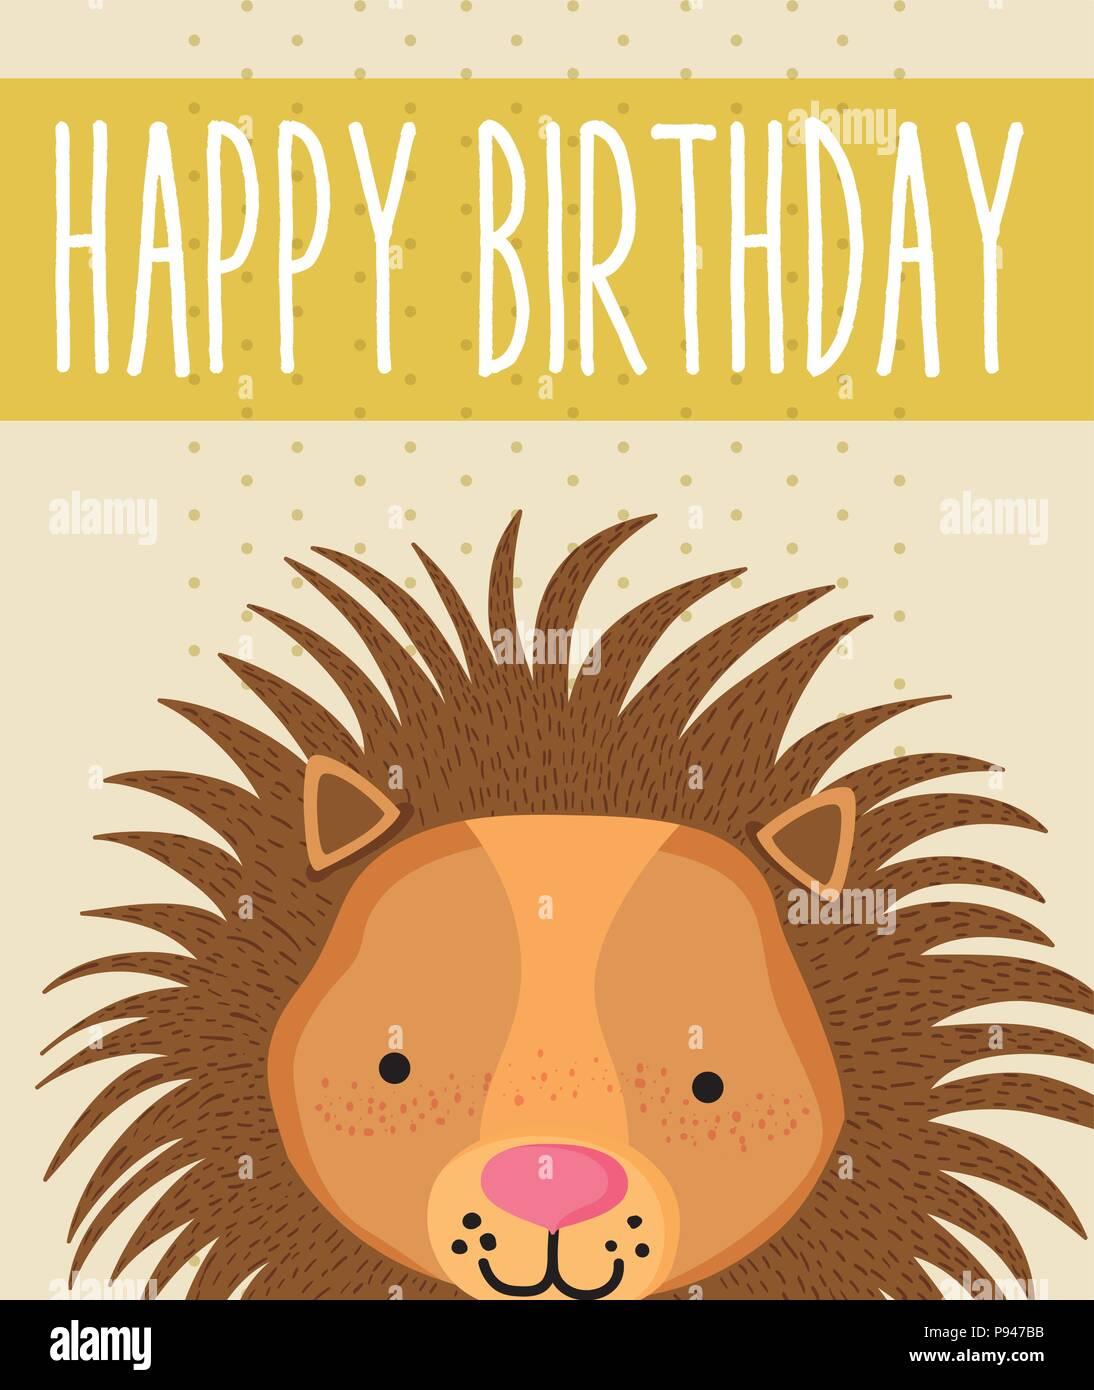 Lion Happy Birthday Card cute cartoon Vector Illustration graphic